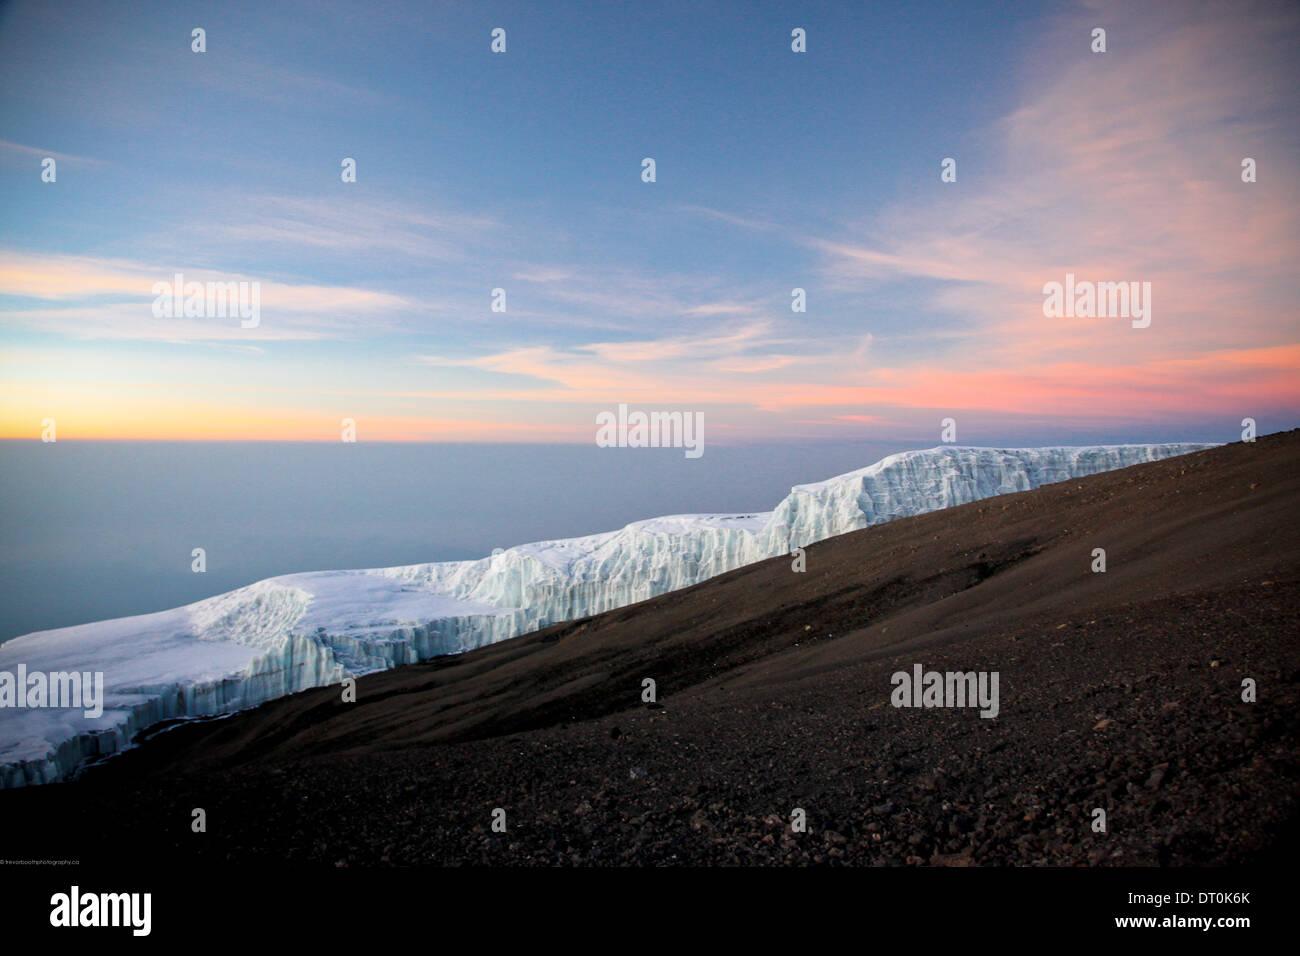 glacier on top of Mount Kilimanjaro at sunrise - Stock Image